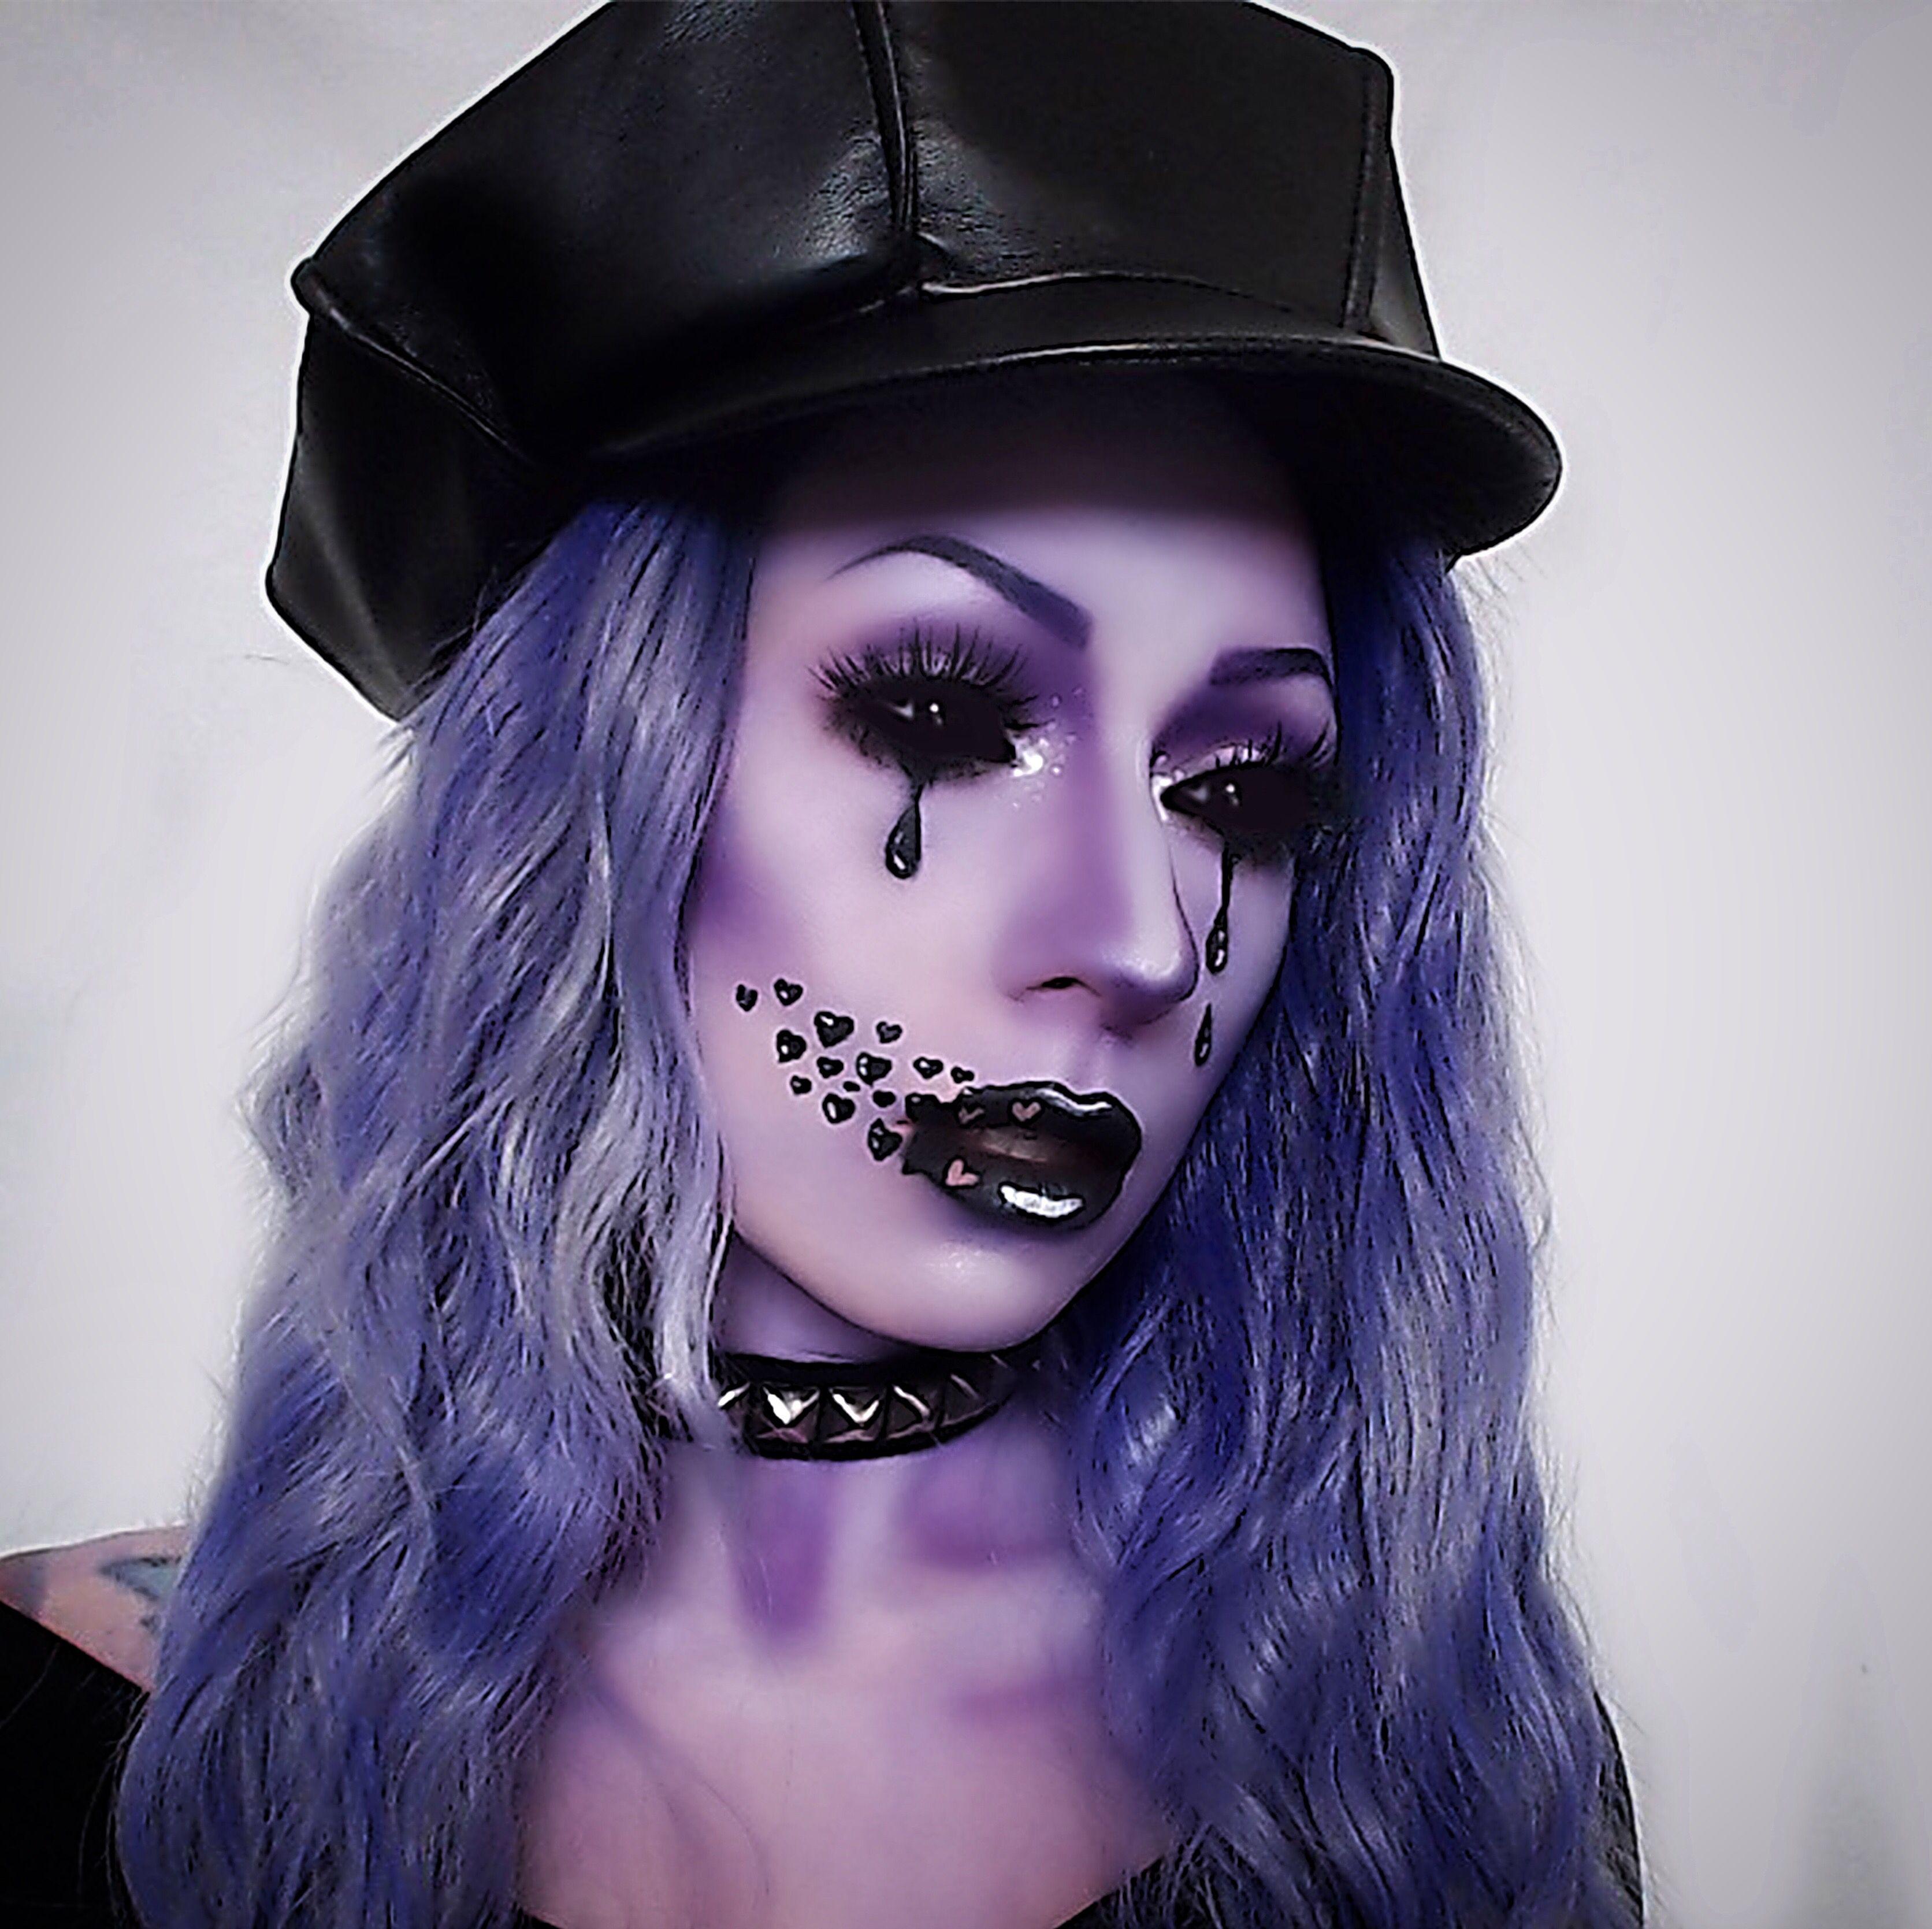 Purple makeup hearts tears crying alien Halloween makeup